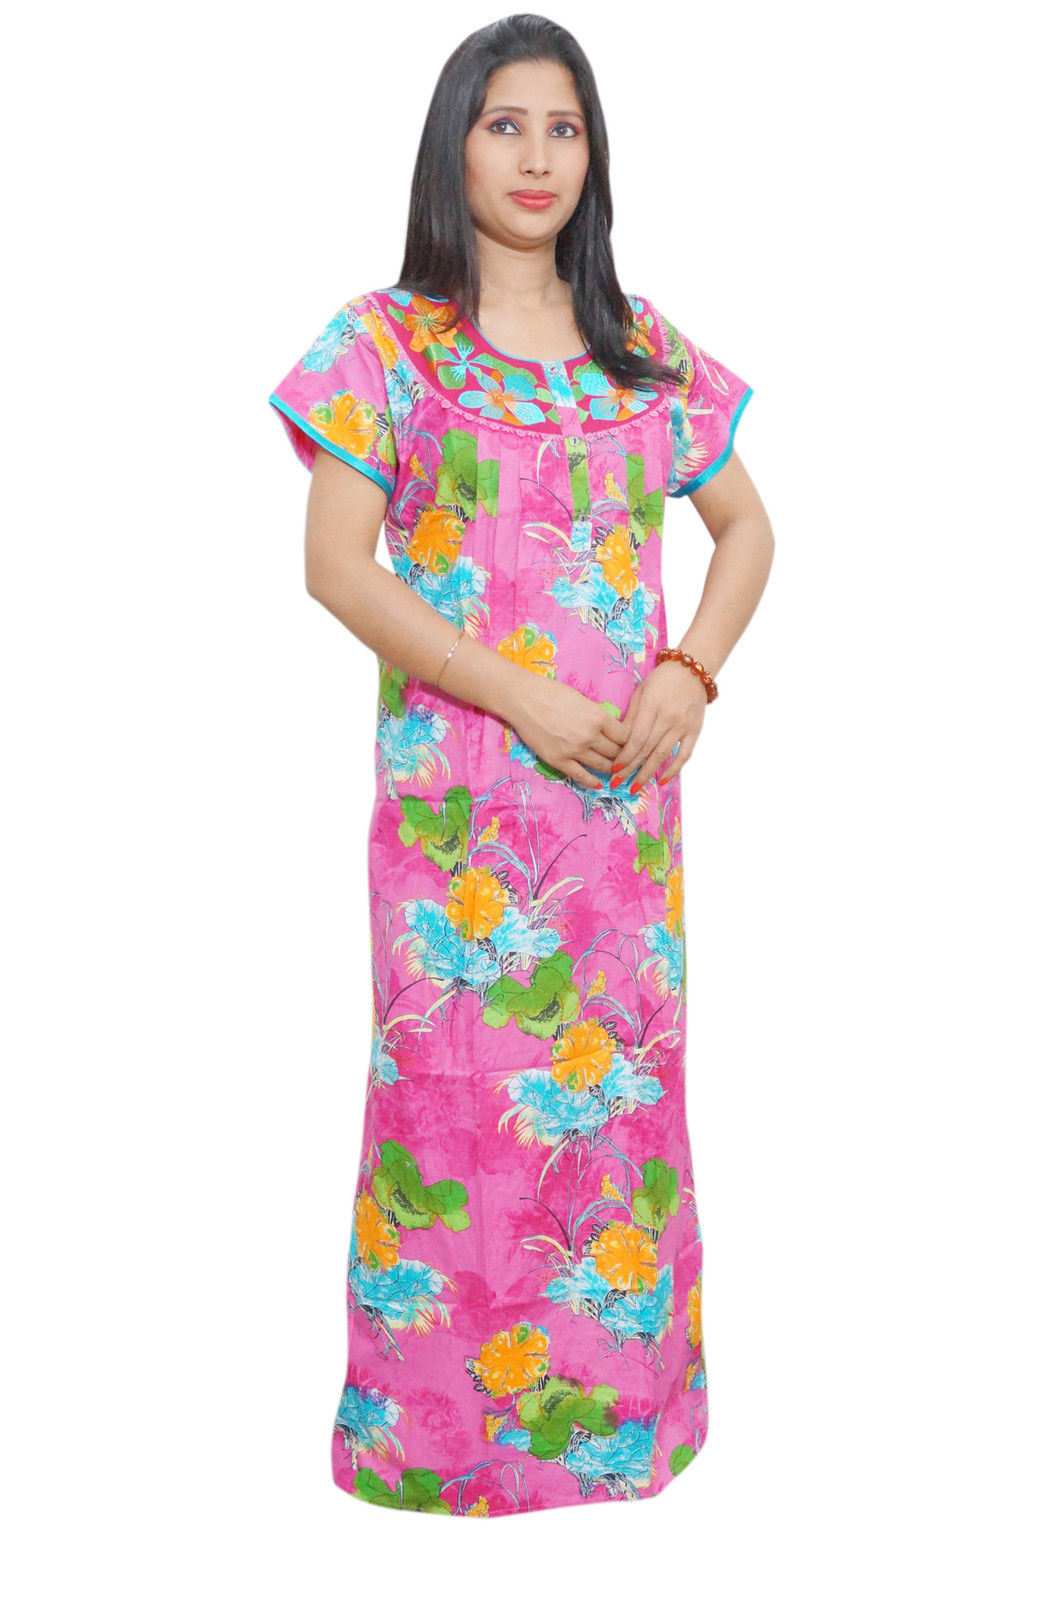 WOMEN\'S COTTON NIGHT GOWN MAXI DRESS – Global Trendzs